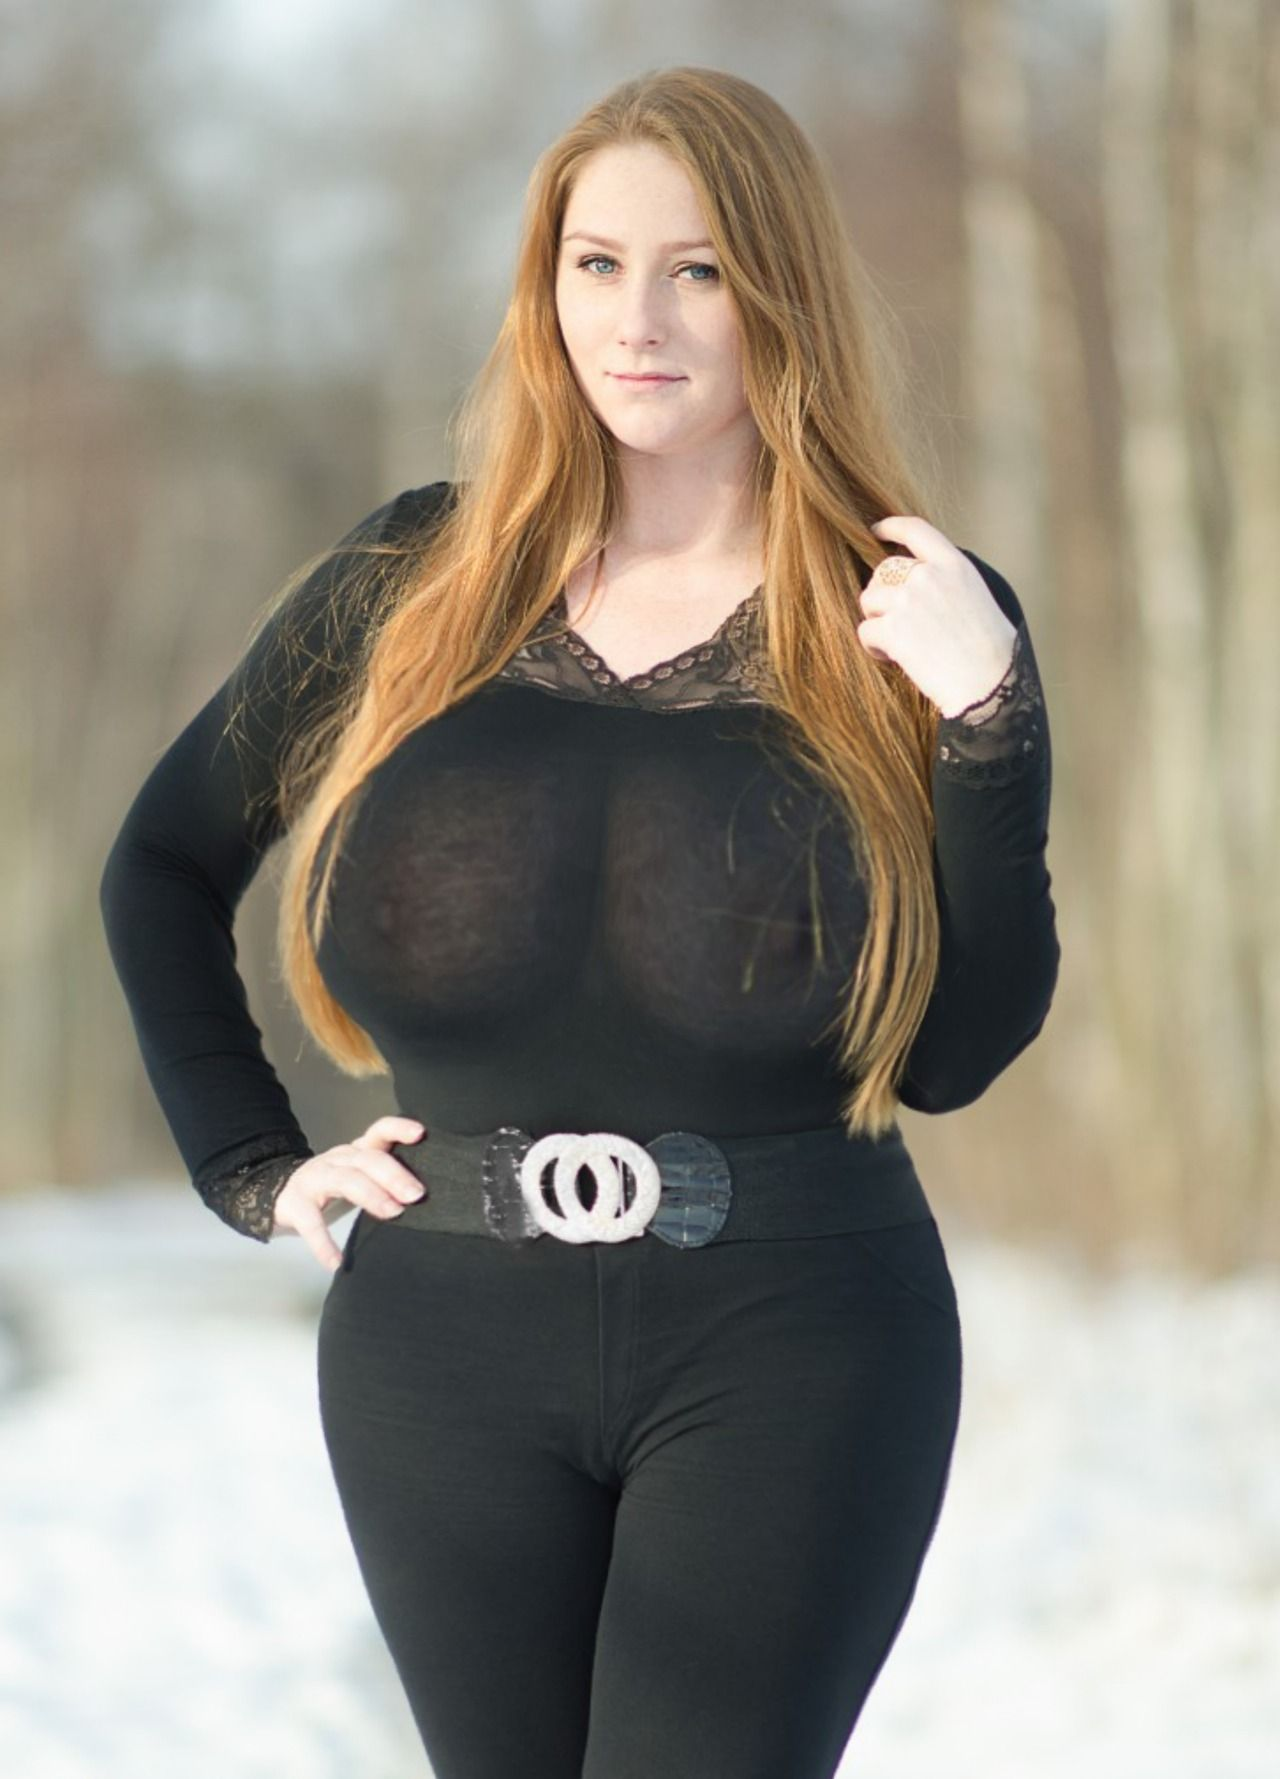 Big tits young milf